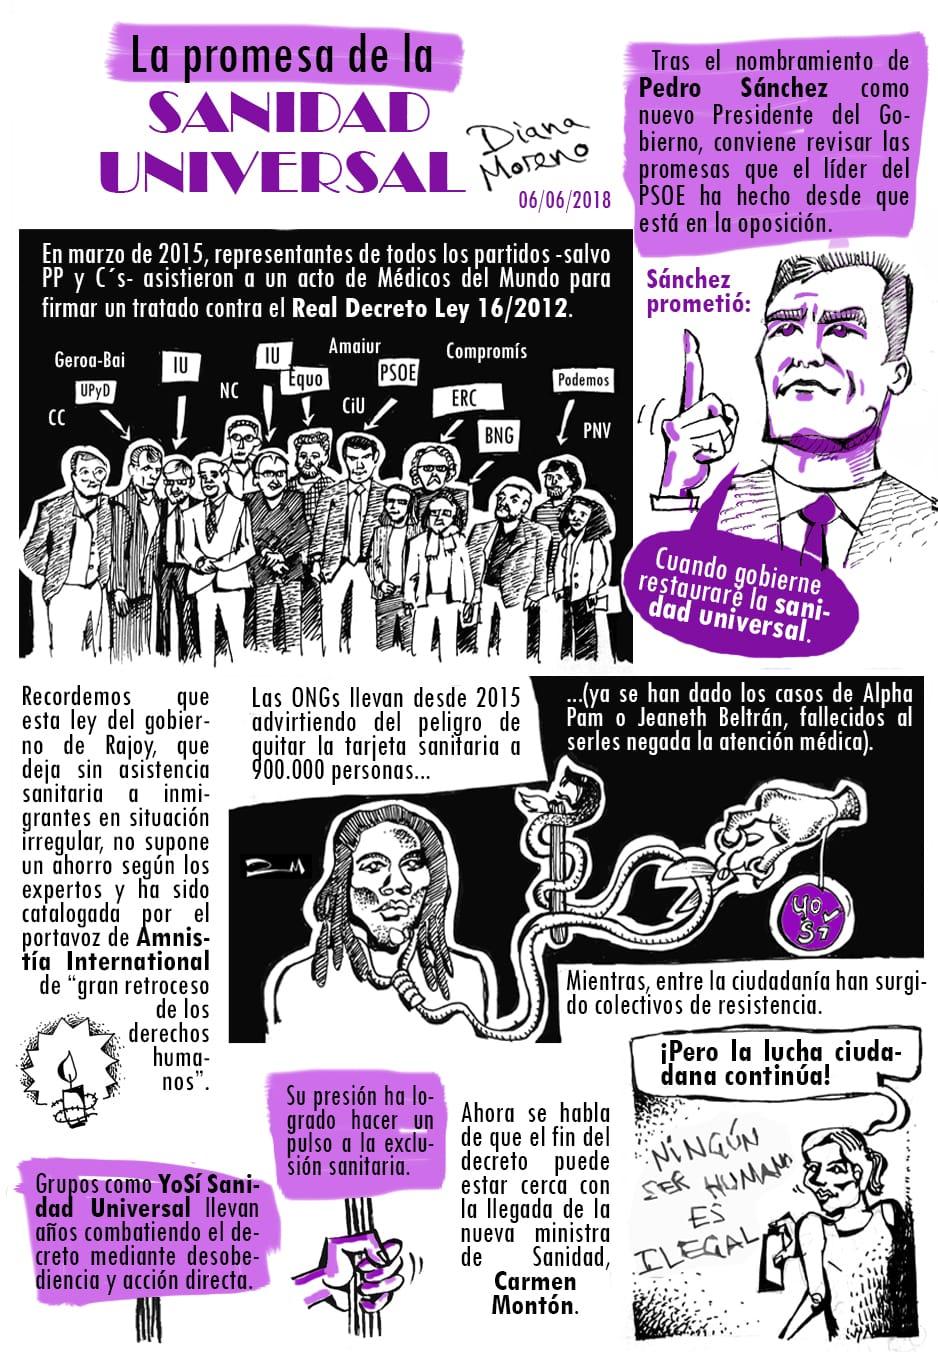 La sanidad universal que prometió Pedro Sanchez